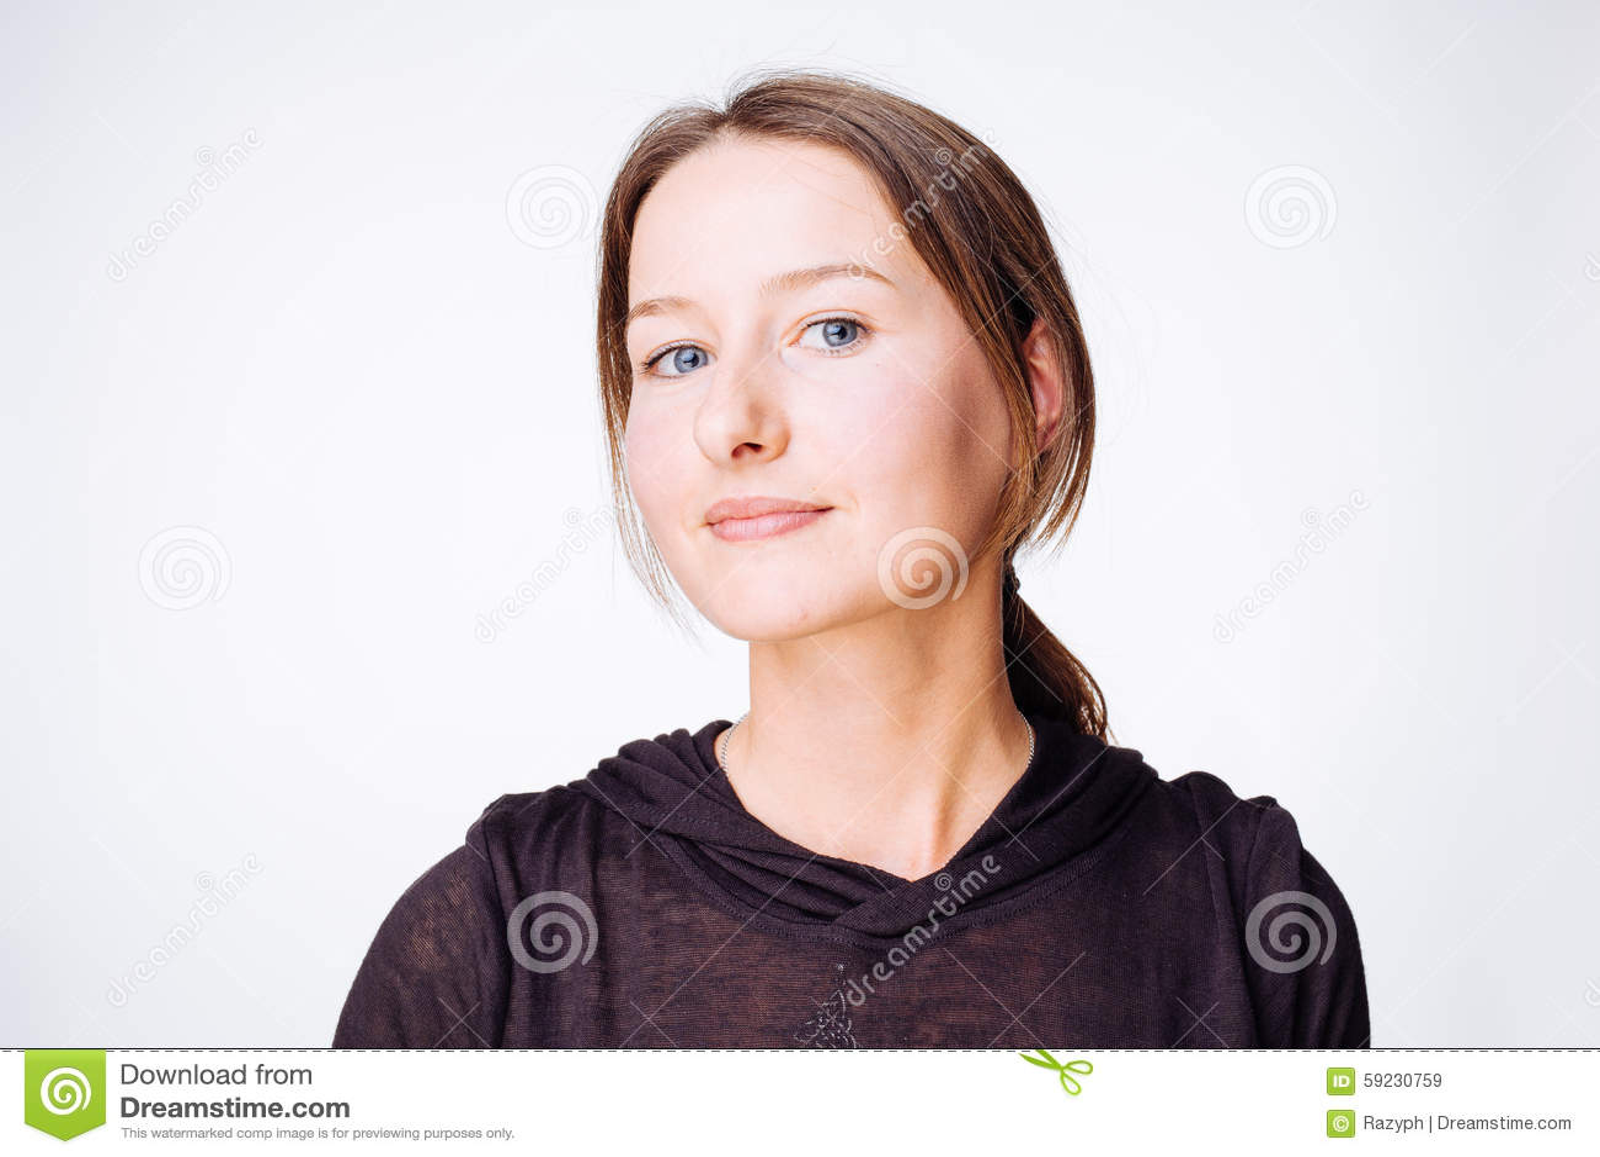 Download Mujer pacífica imagen de archivo. Imagen de negro, positividad - 59230759